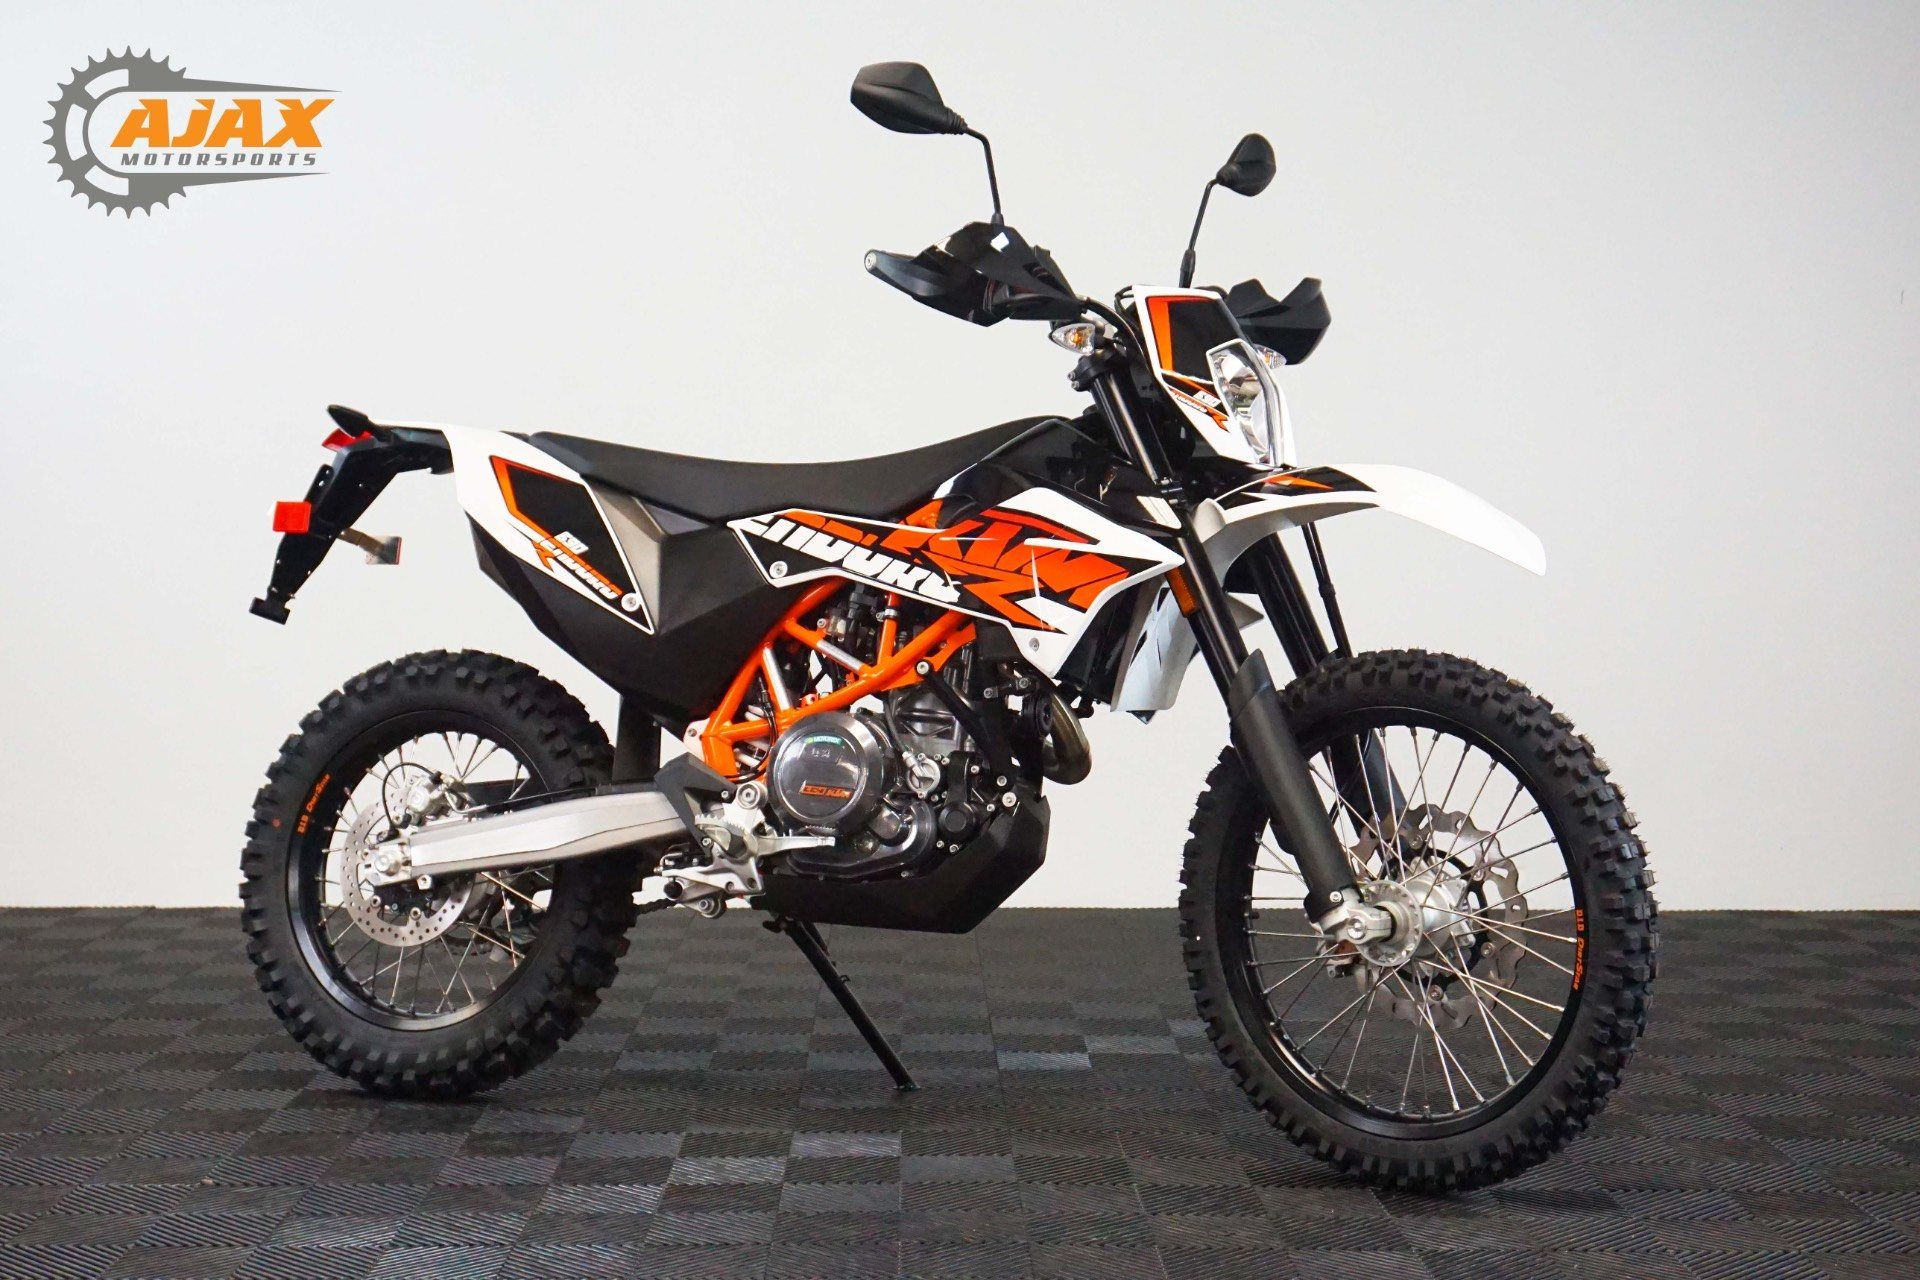 New 2018 KTM 690 Enduro R Motorcycles in Oklahoma City, OK   Stock ...